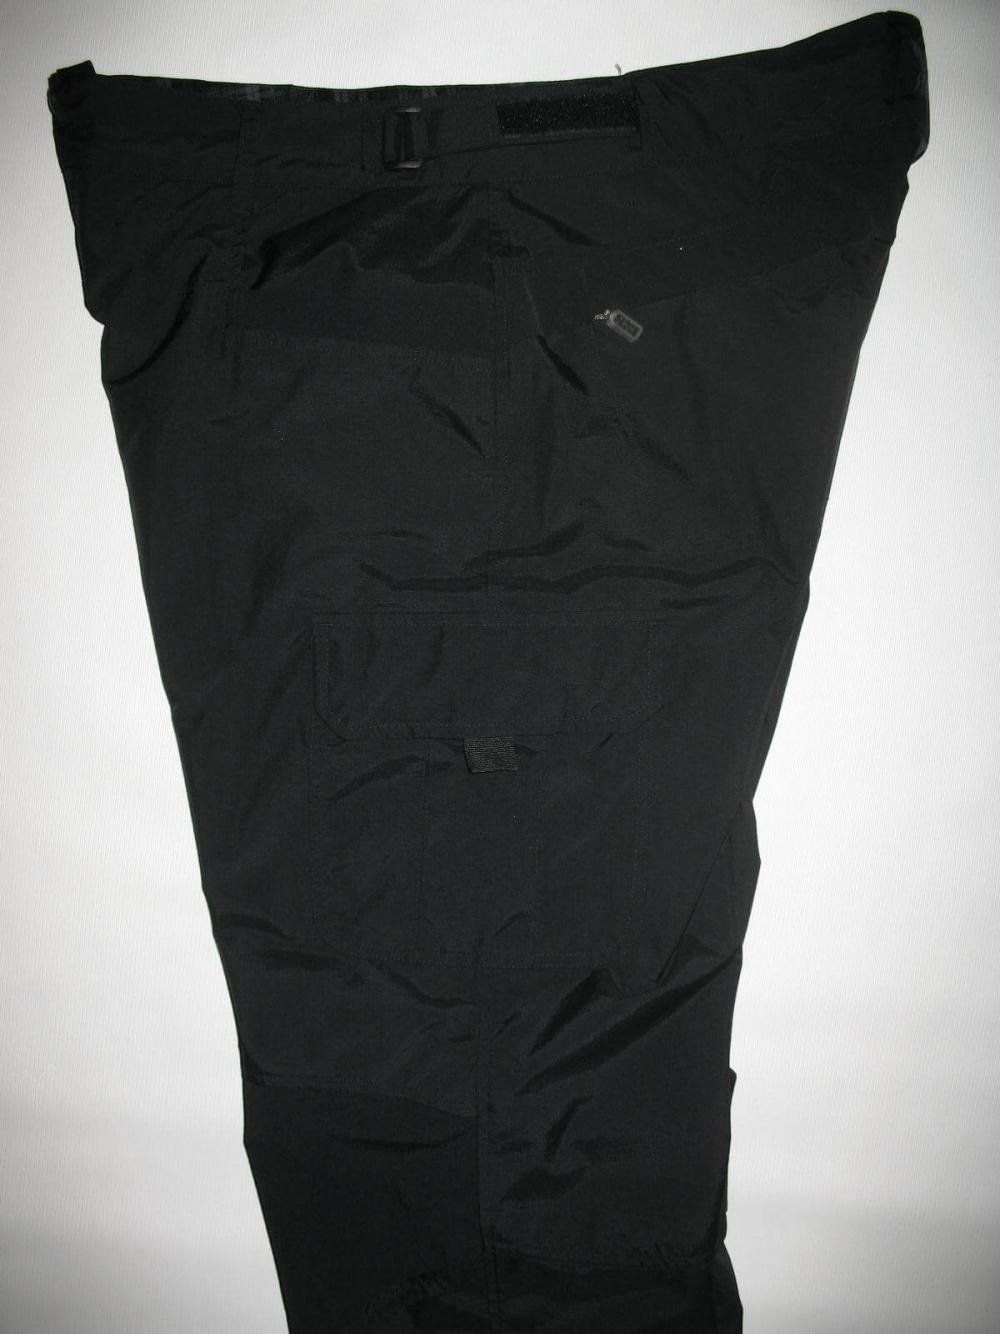 Штаны IXS bc-elite hurtle bike pants (размер XL) - 6